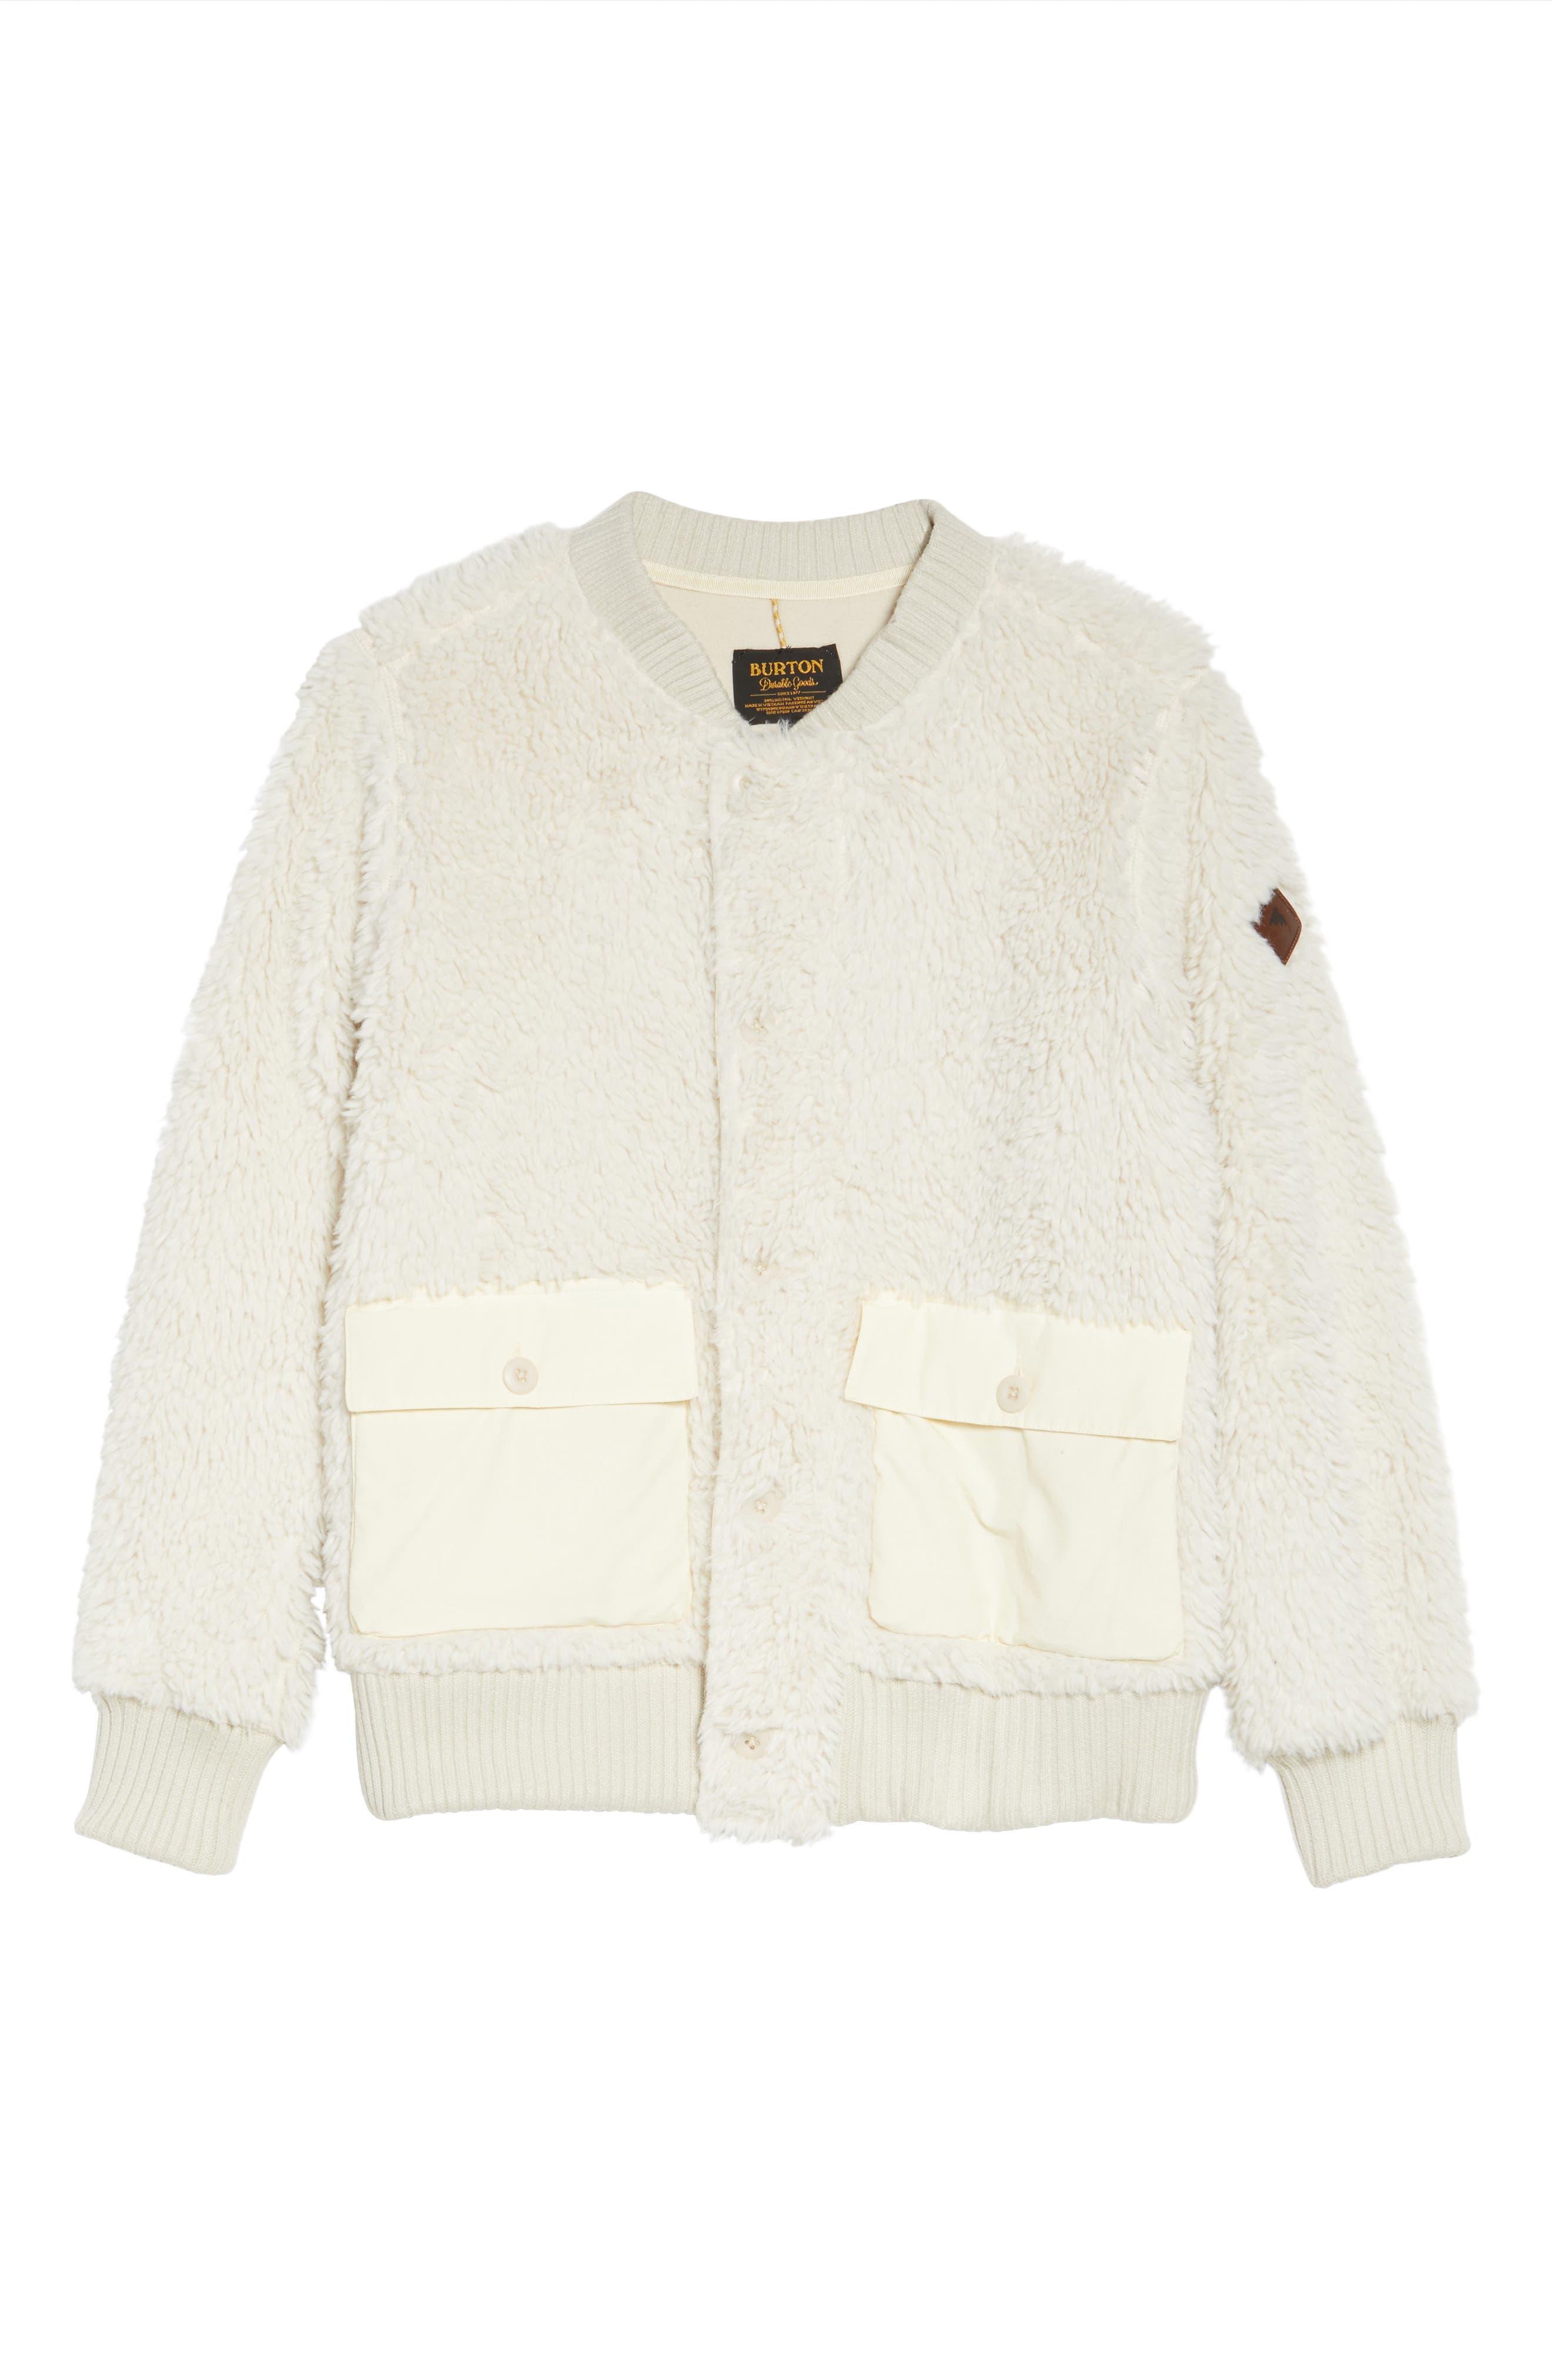 Shawmut High Pile DRYRIDE Thermex Fleece Jacket,                             Alternate thumbnail 7, color,                             Bone White